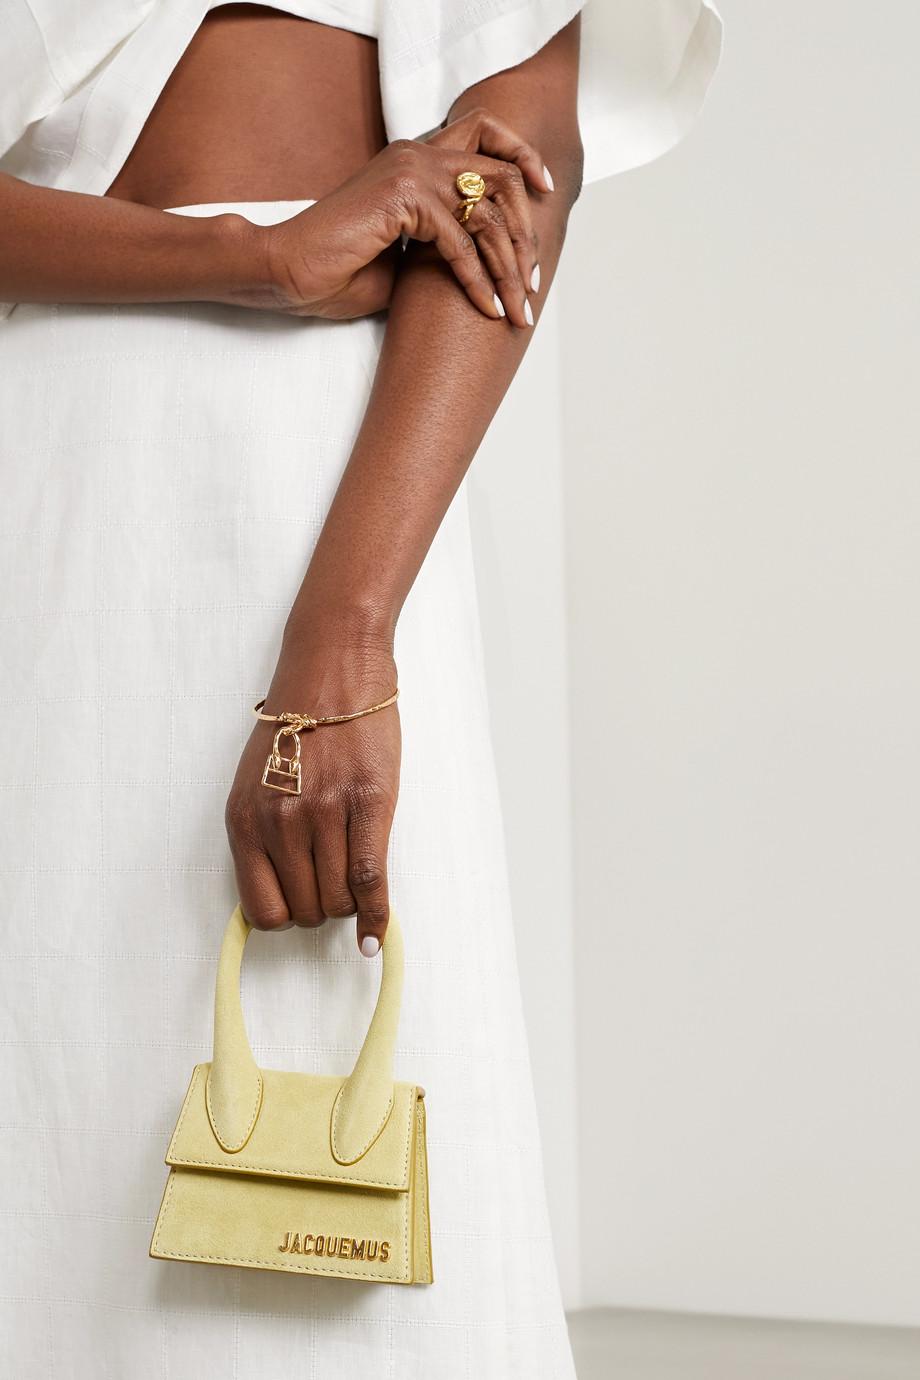 Jacquemus Le Chiquita hammered gold-tone bracelet